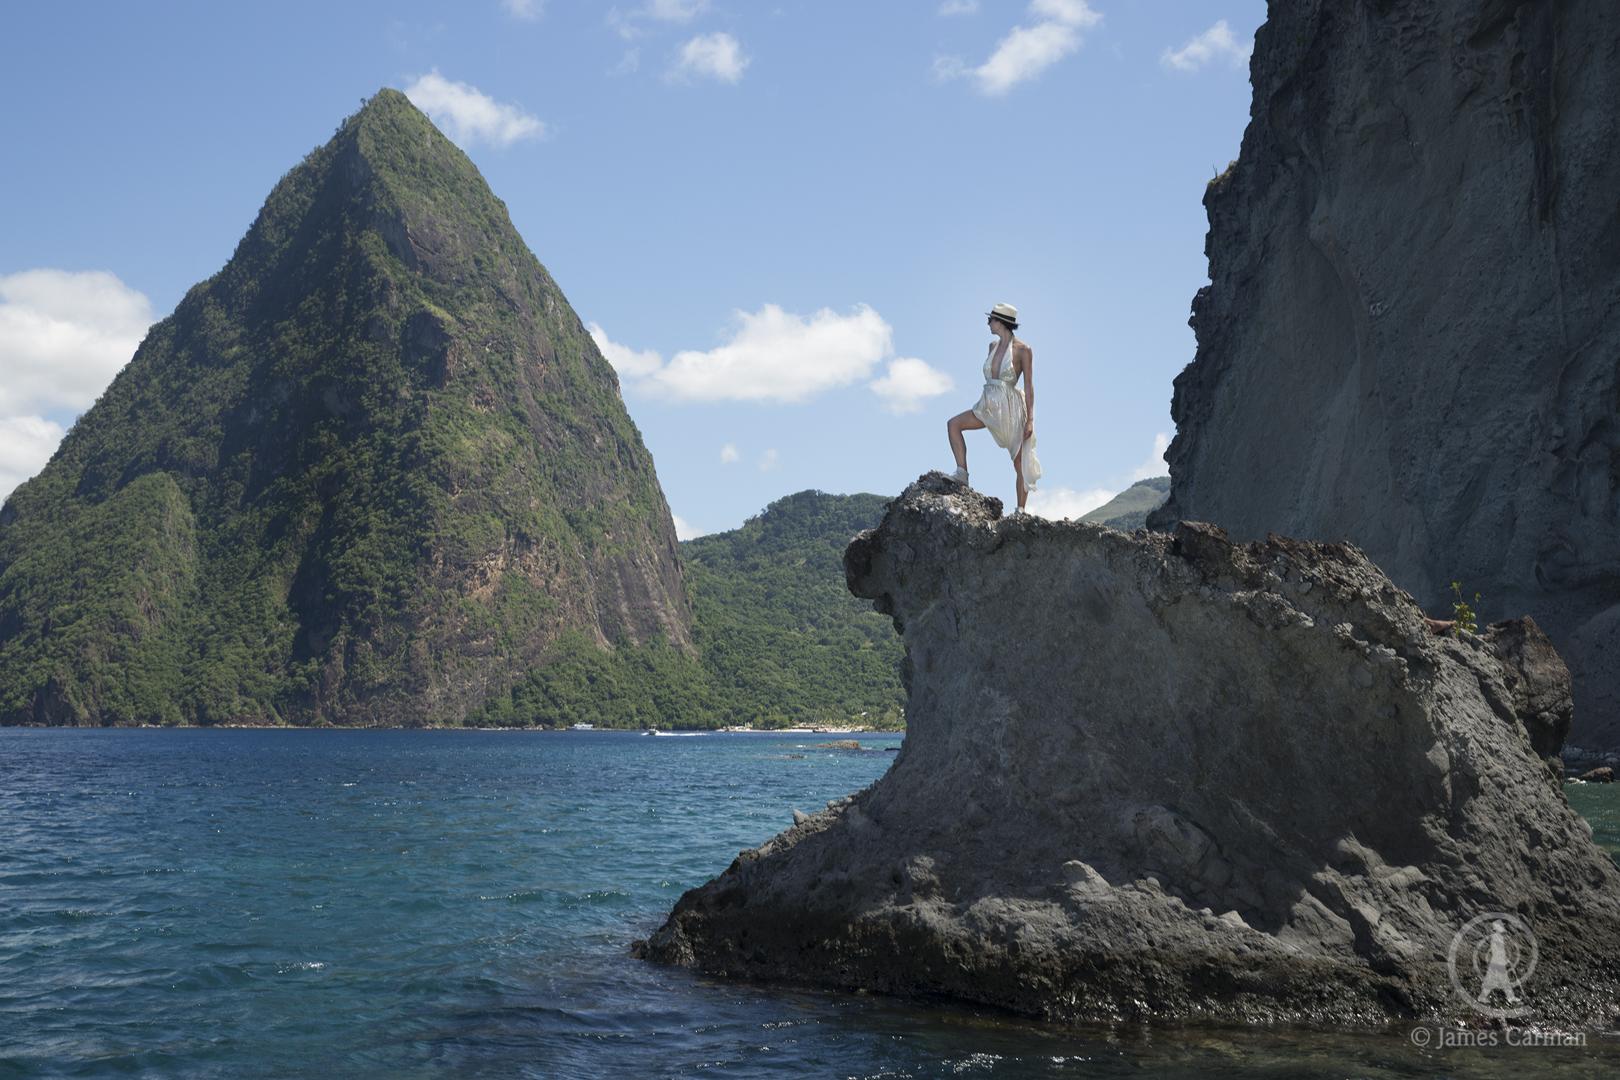 Surveying the Caribbean Sea.